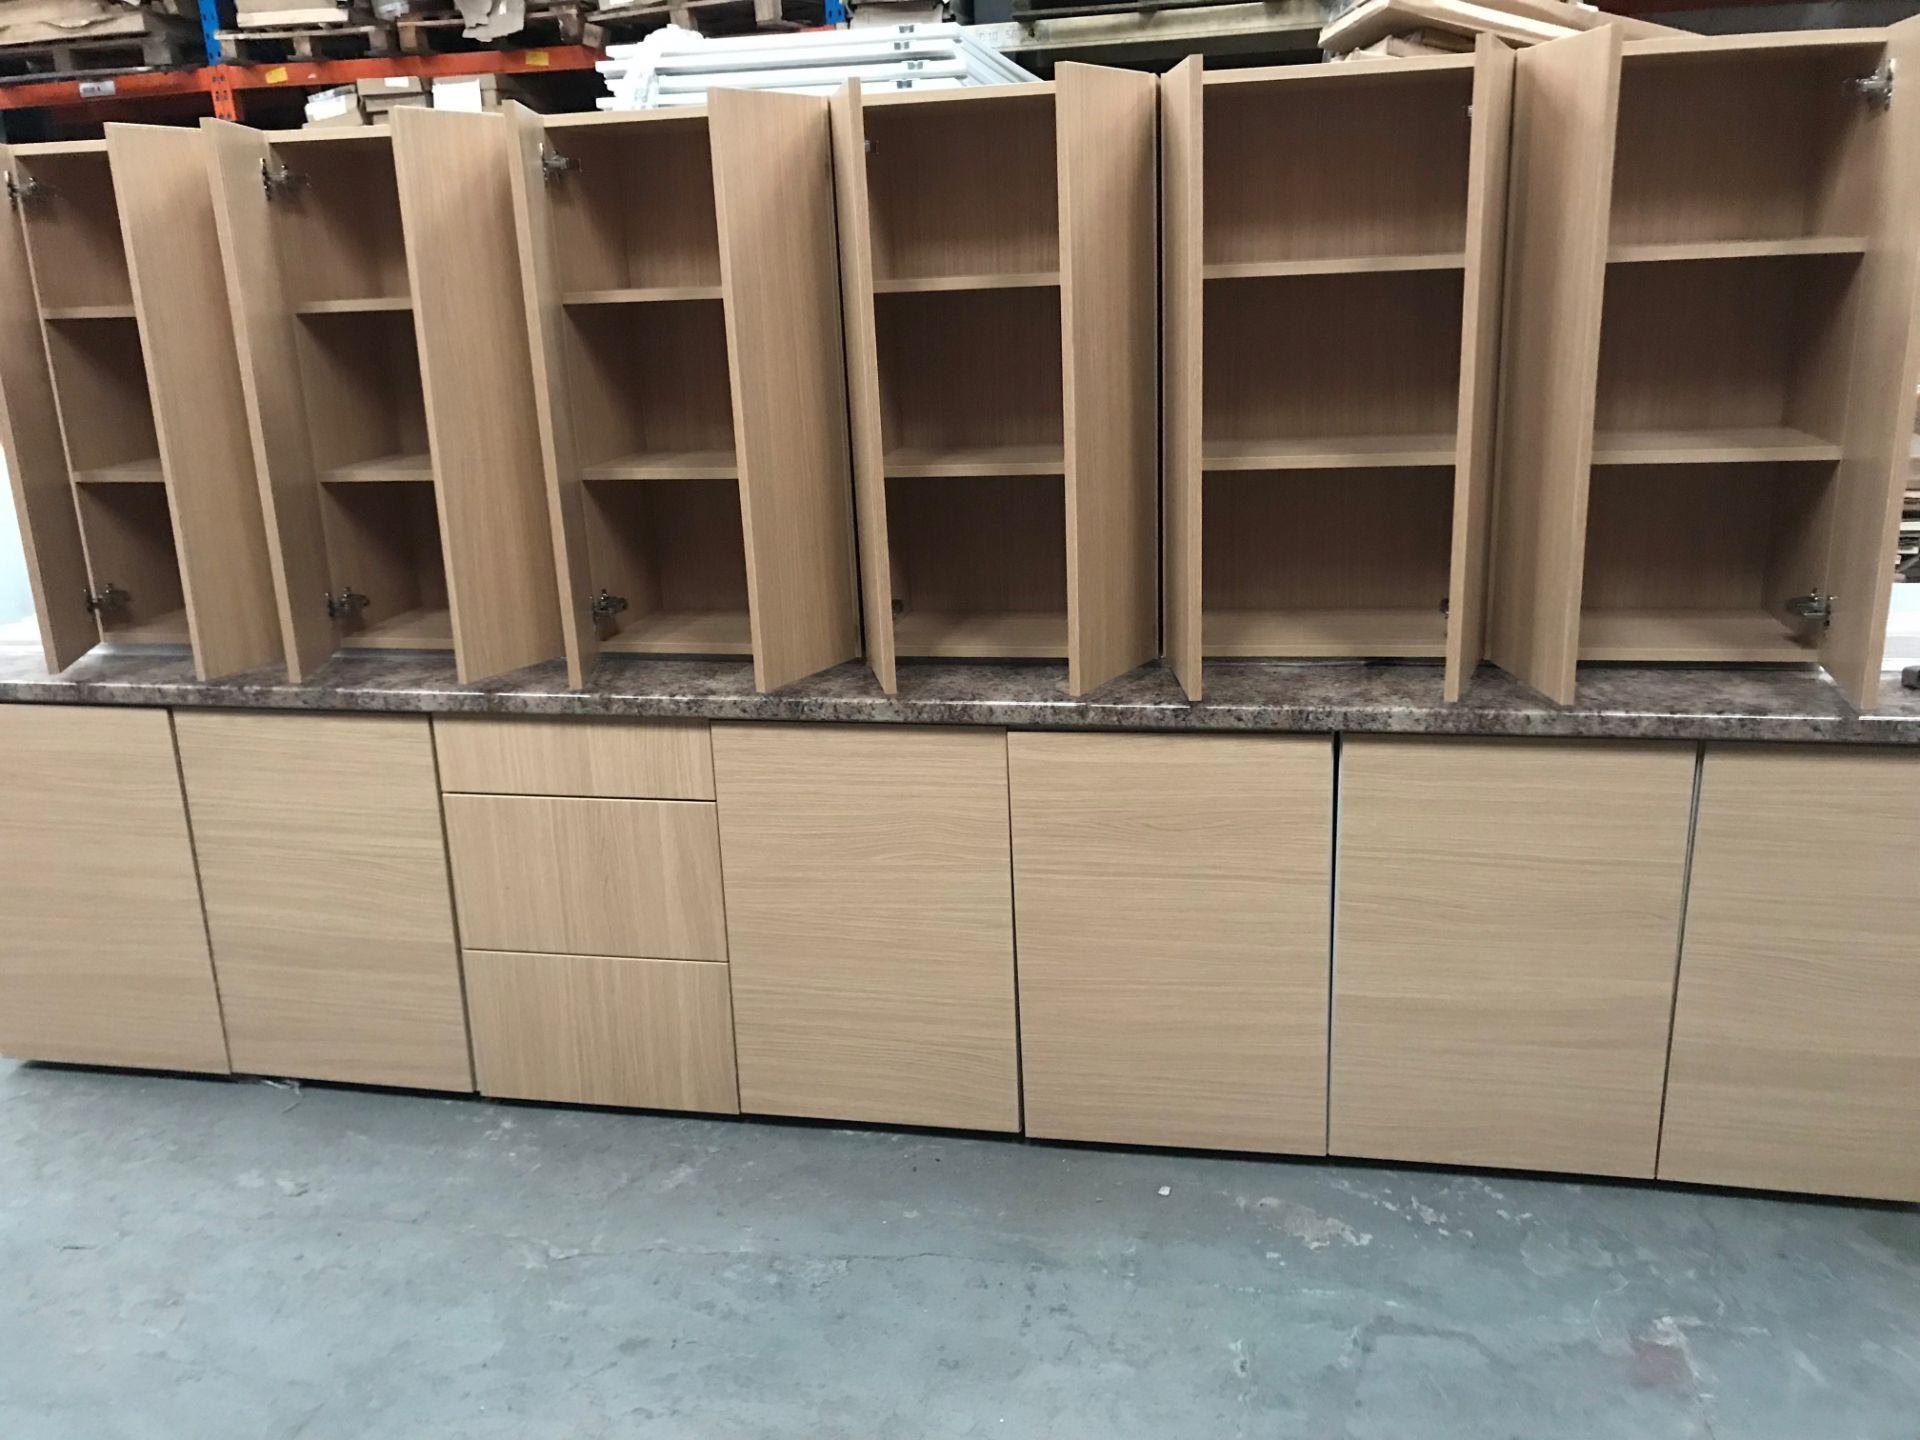 Kitchen units, 6x 500x 900 wall units, 5x 500 base, 1x 400 base, 1 x500 drawer pack (viewing and